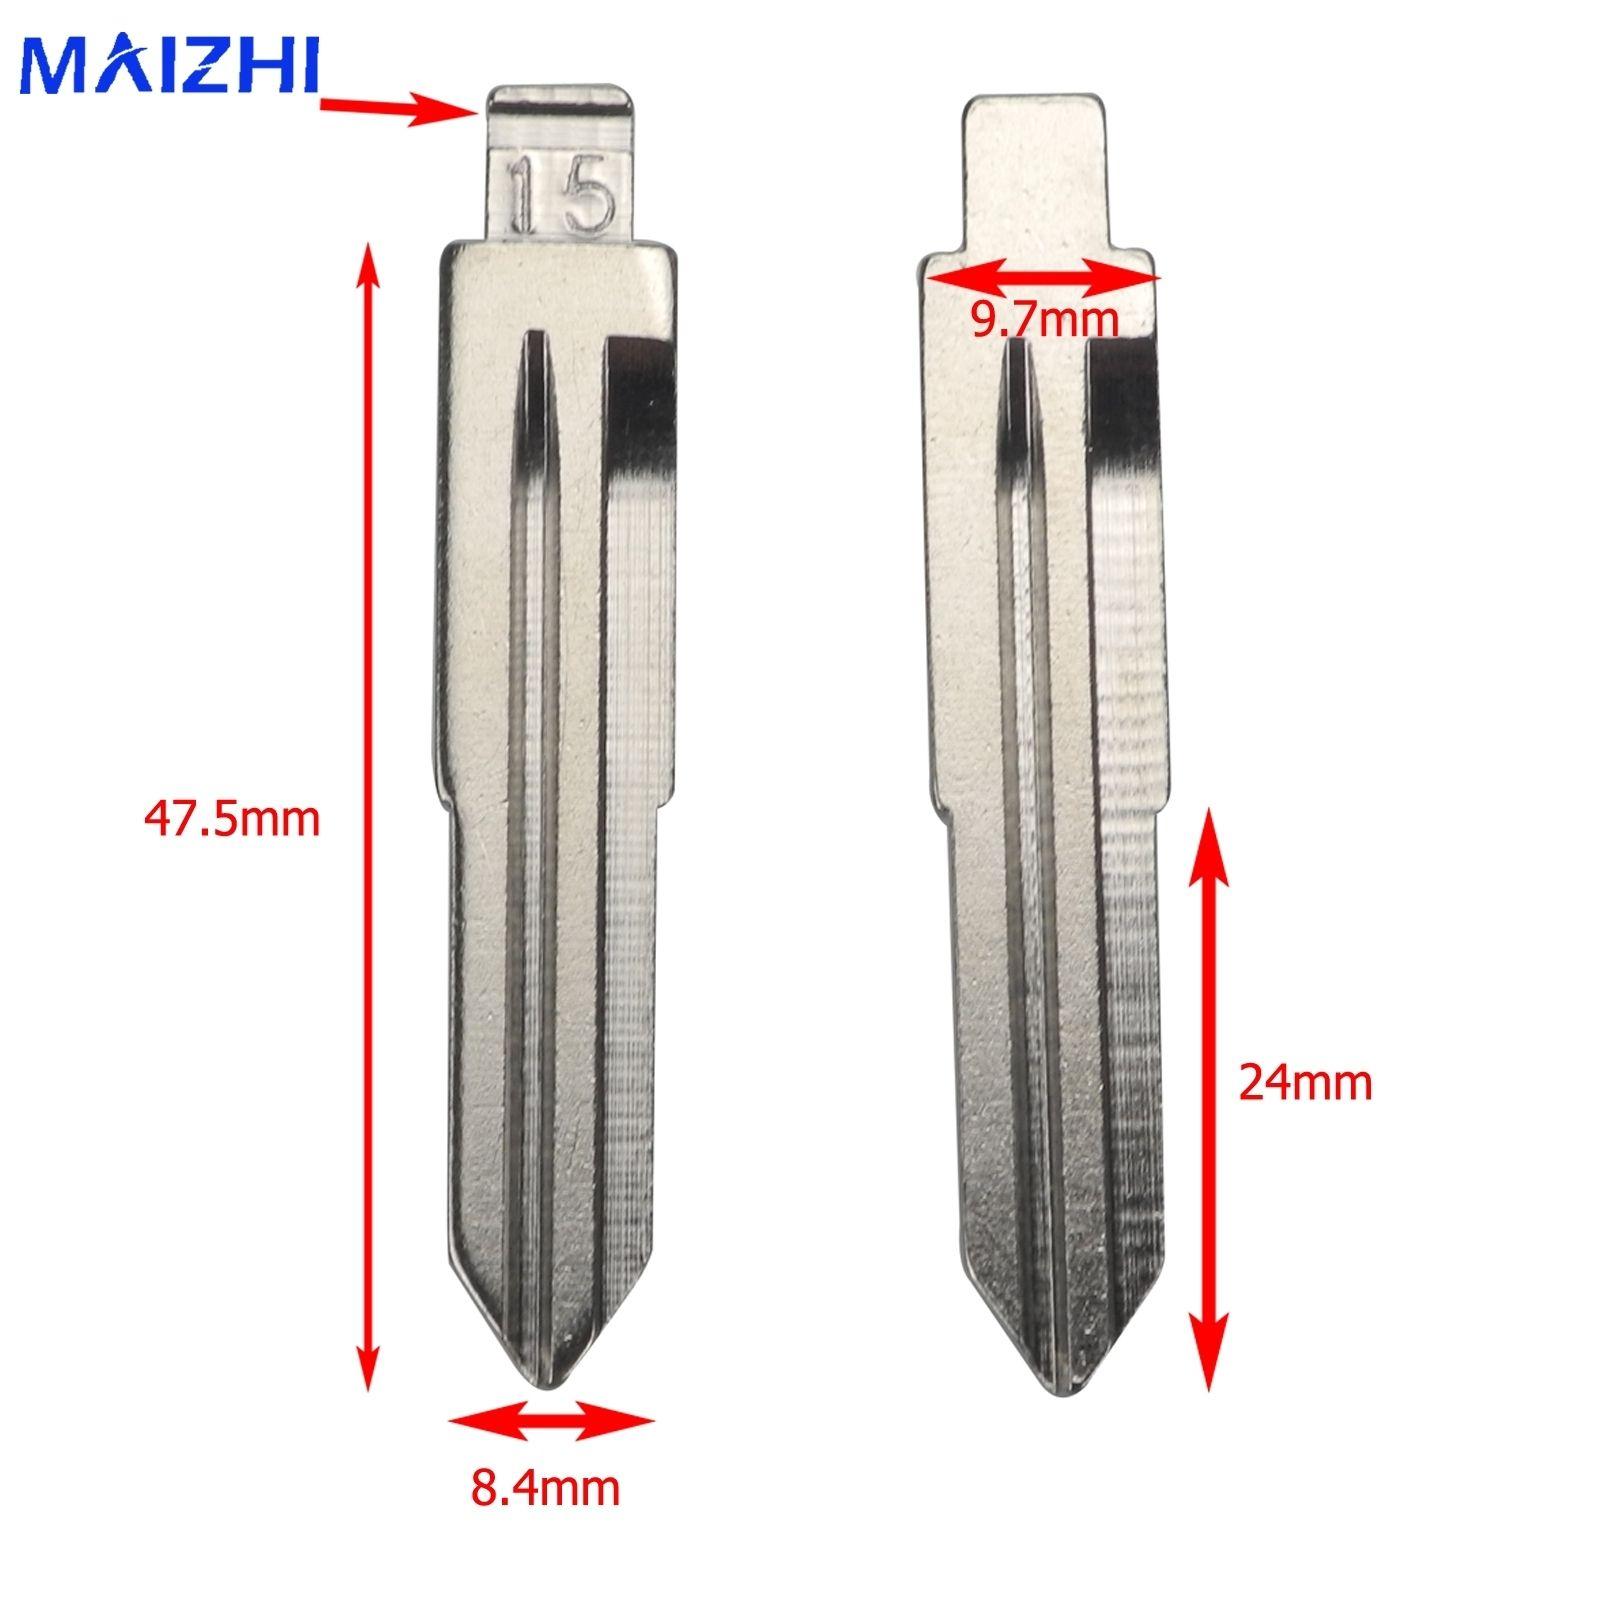 Hu83 Empty Car Key Blade For Chevrolet Epica Hyundai Elantra Qq, Sangyong  Kia For Mercedes -benz Auto -styling